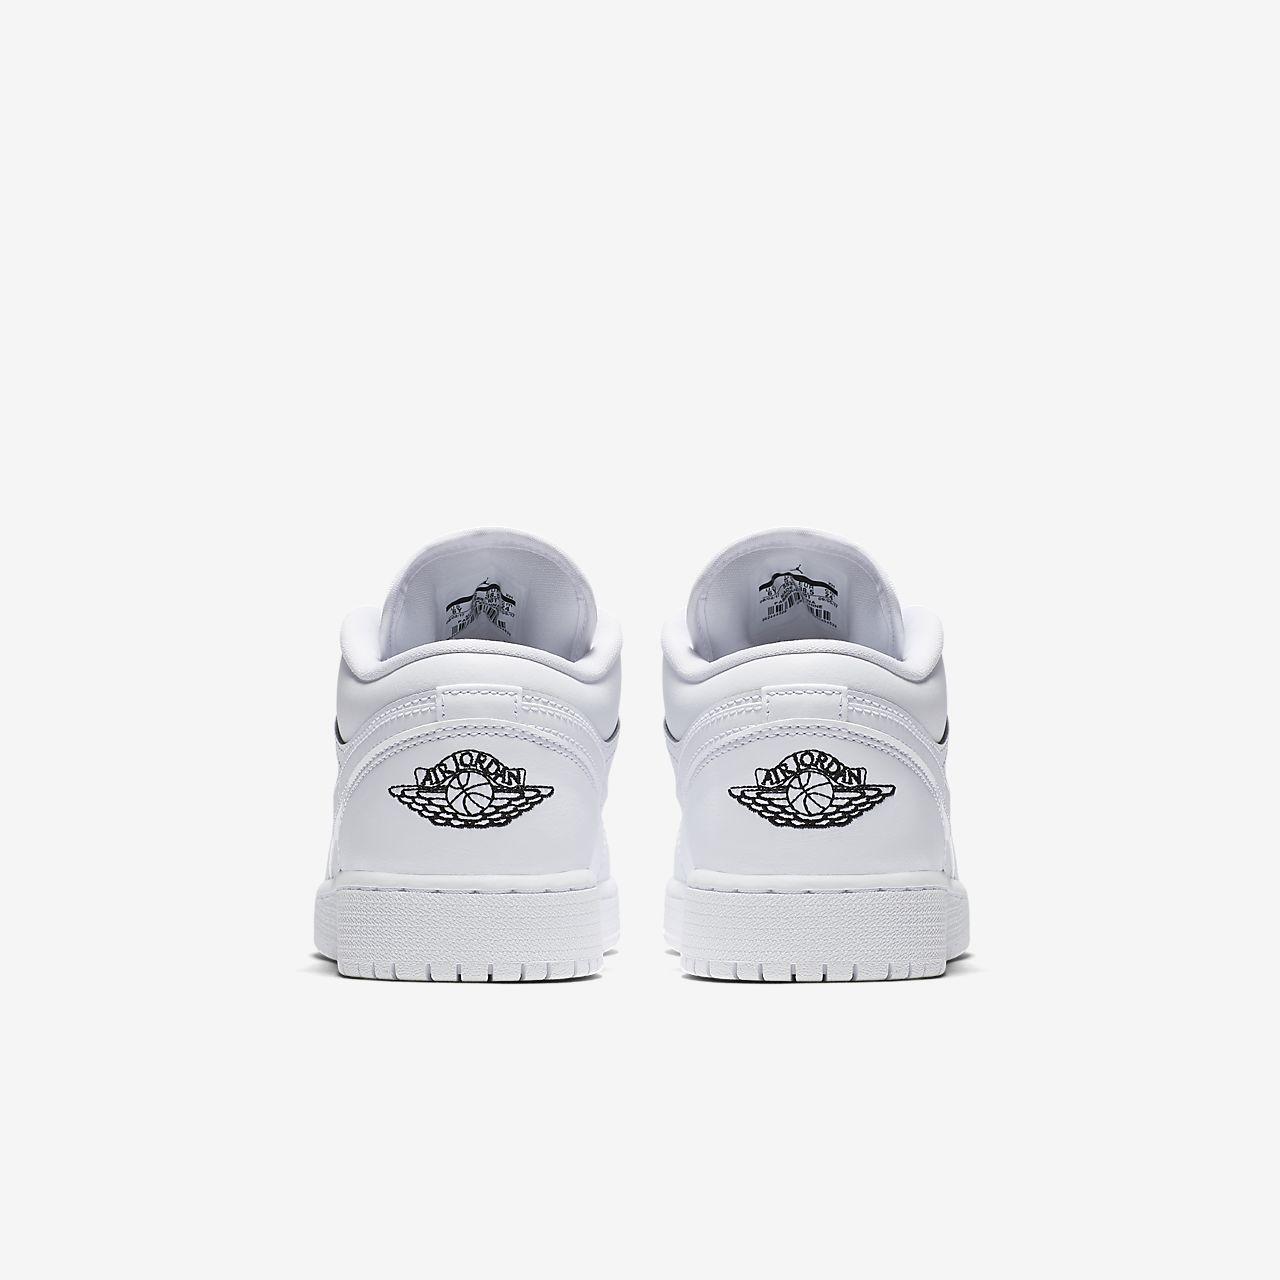 the latest 6e0e6 afde2 ... Air Jordan 1 Low Older Kids  Shoe